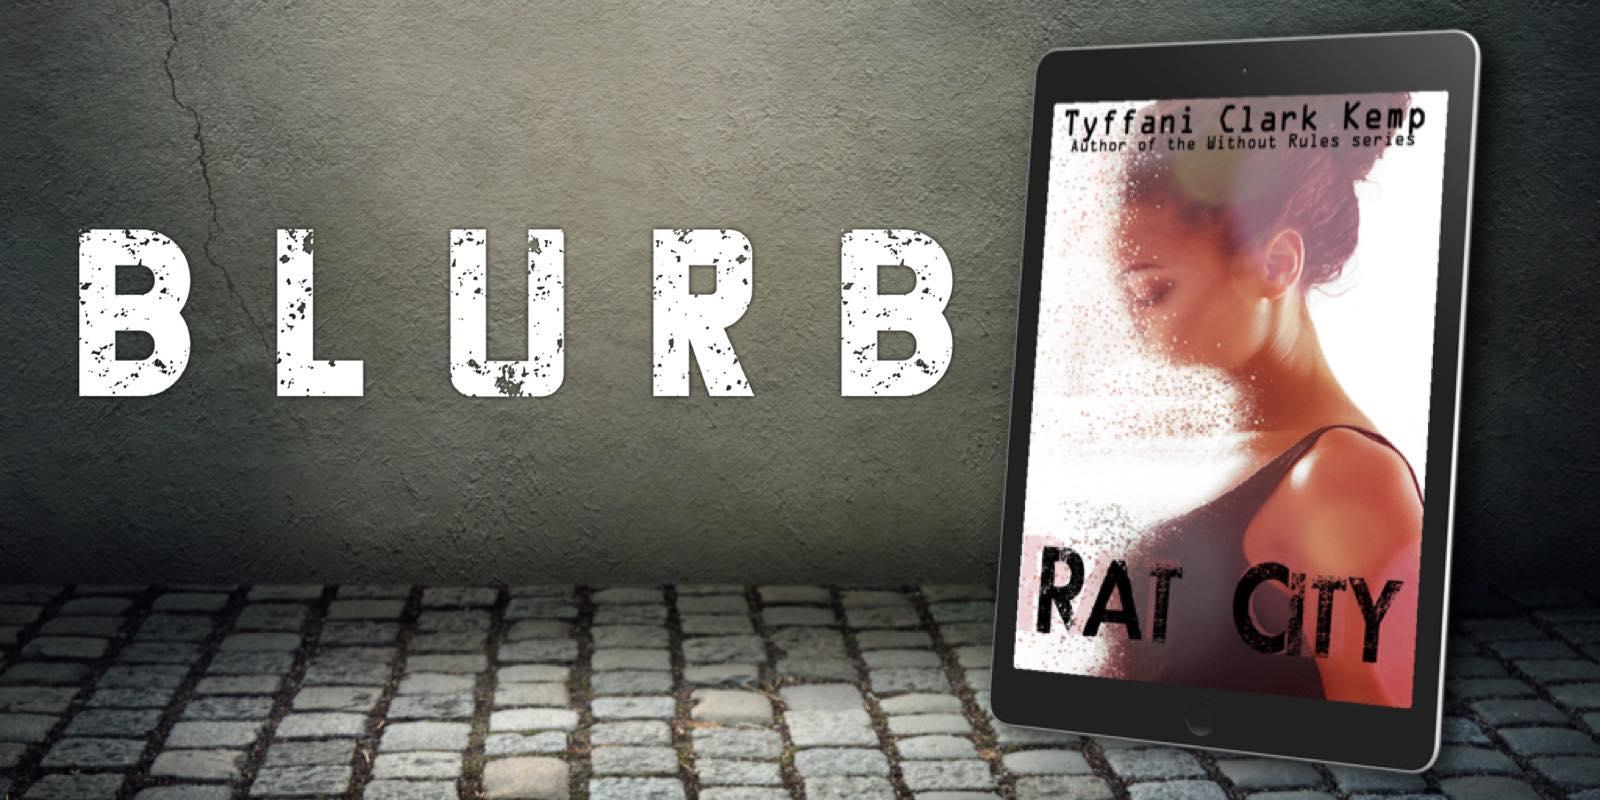 rat city blurb